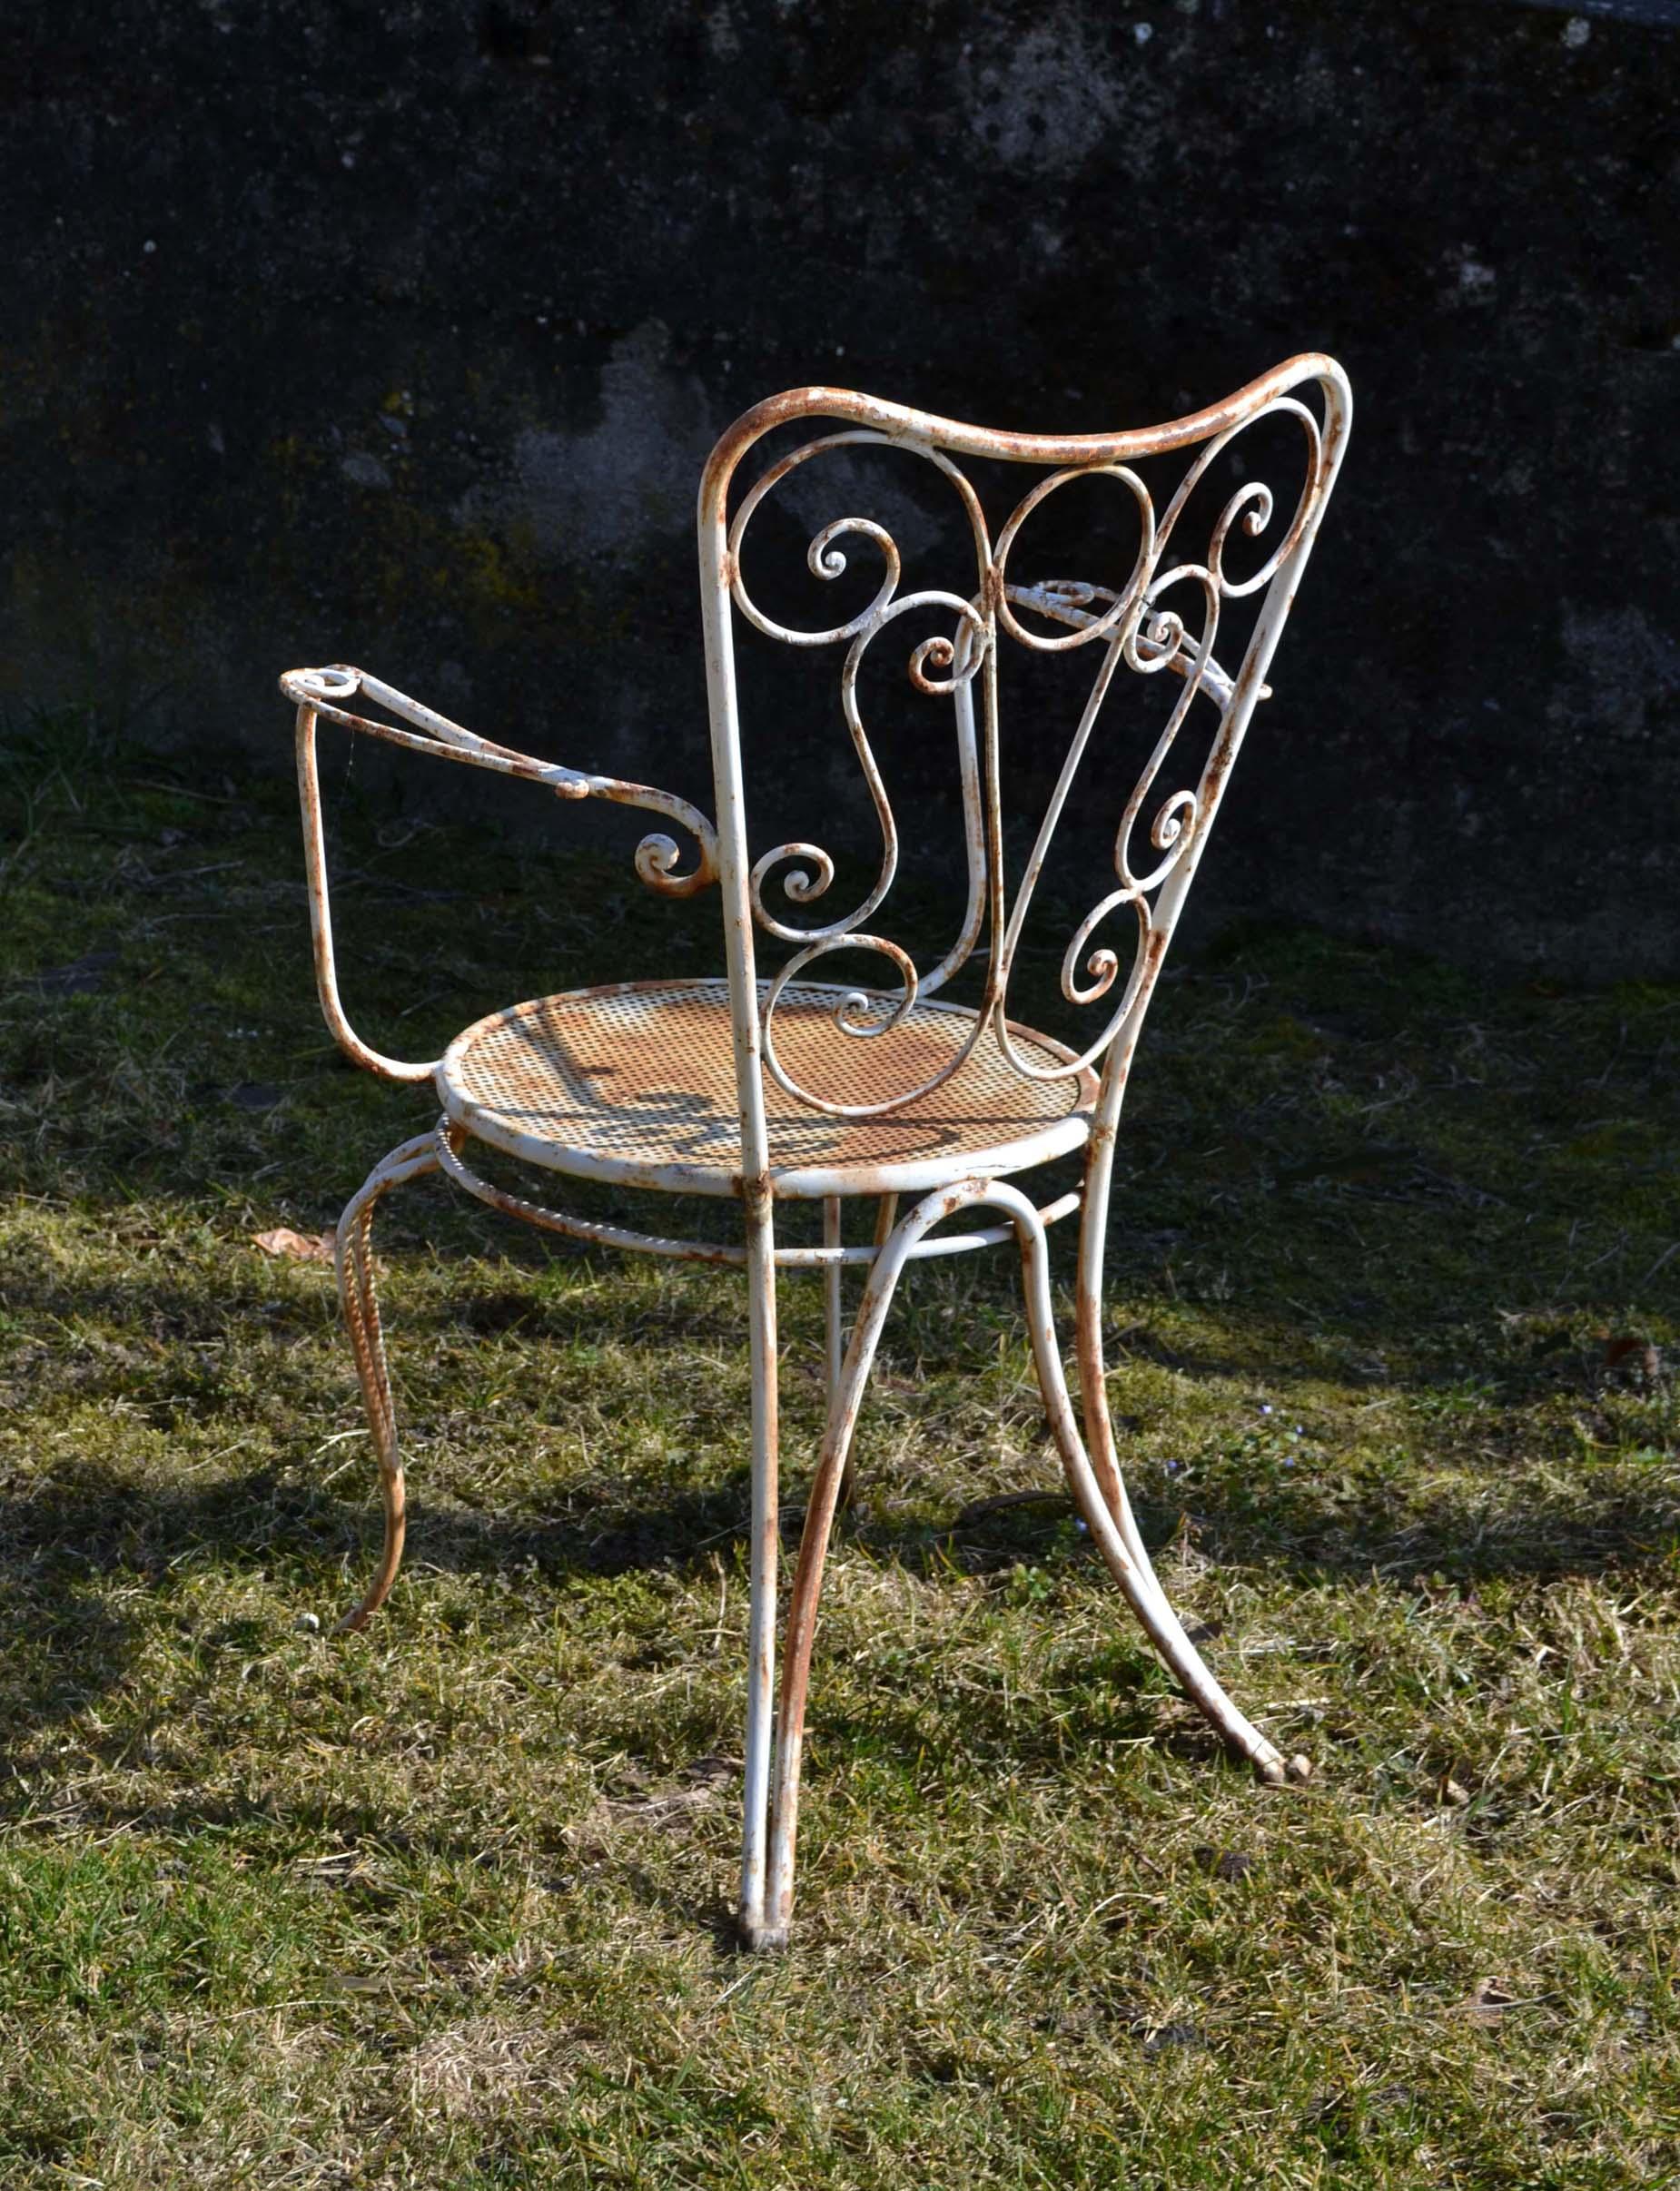 Mobilier de jardin ancien et objets en fer brocante d co - Chaises de jardin en fer ...